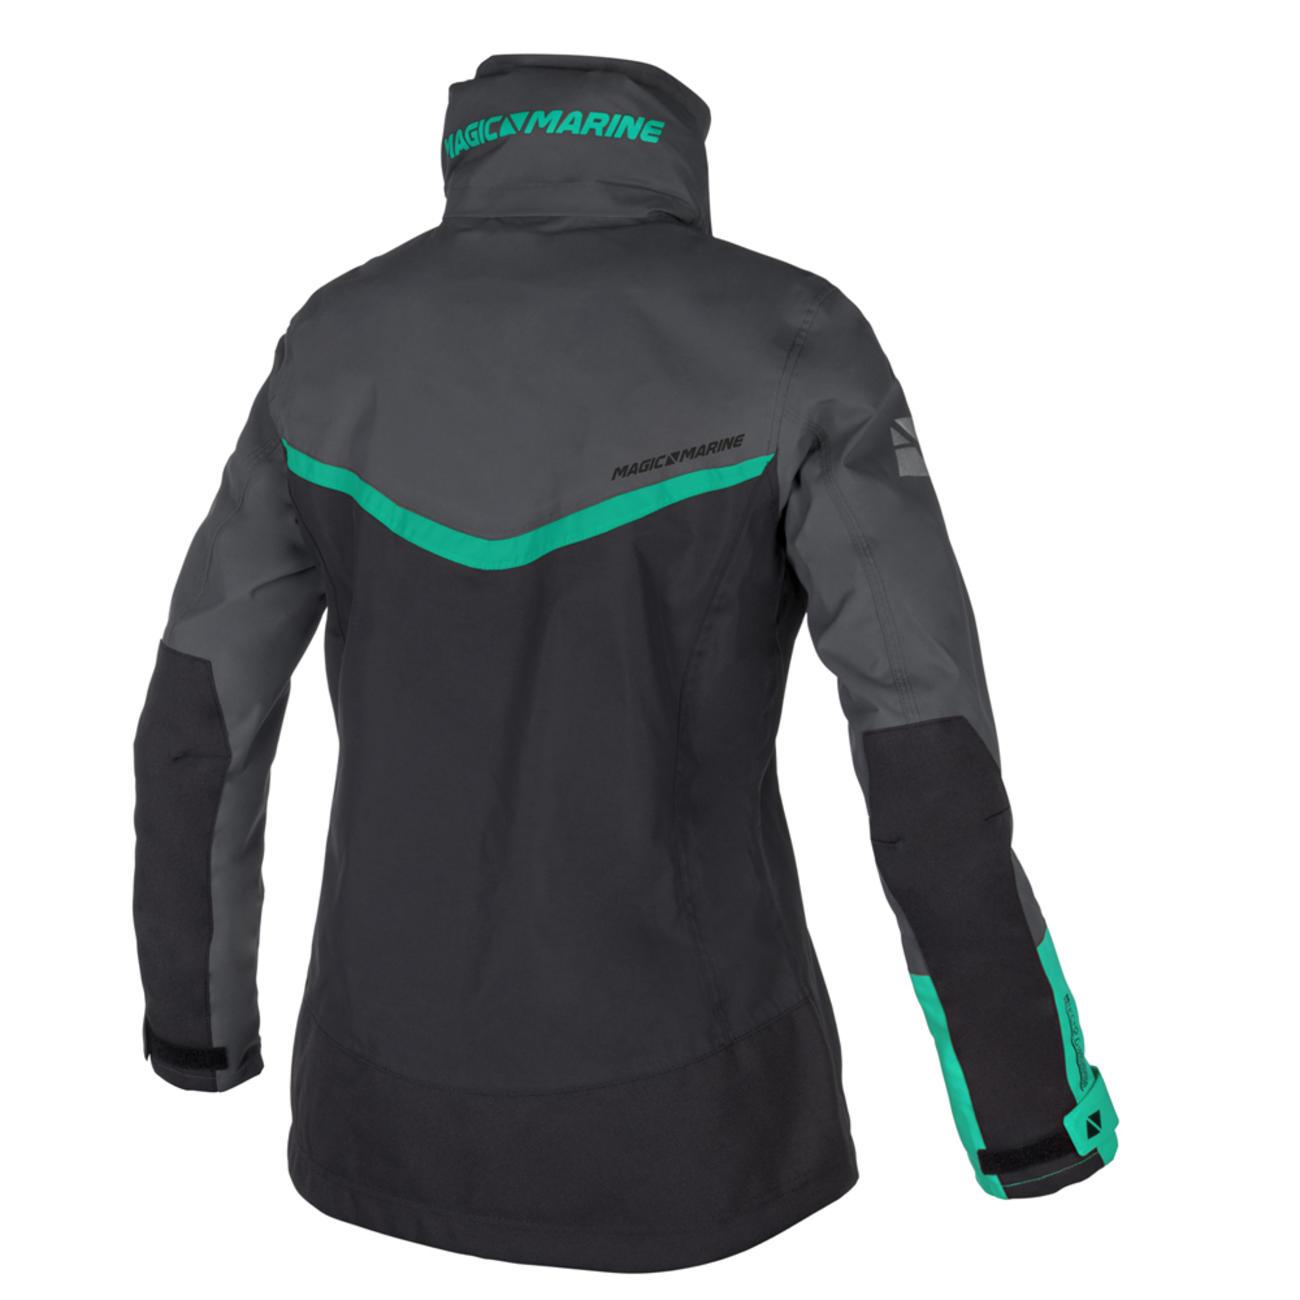 Element Jacket 2Layer Women ハードシェル レインジャケット スリムフィット